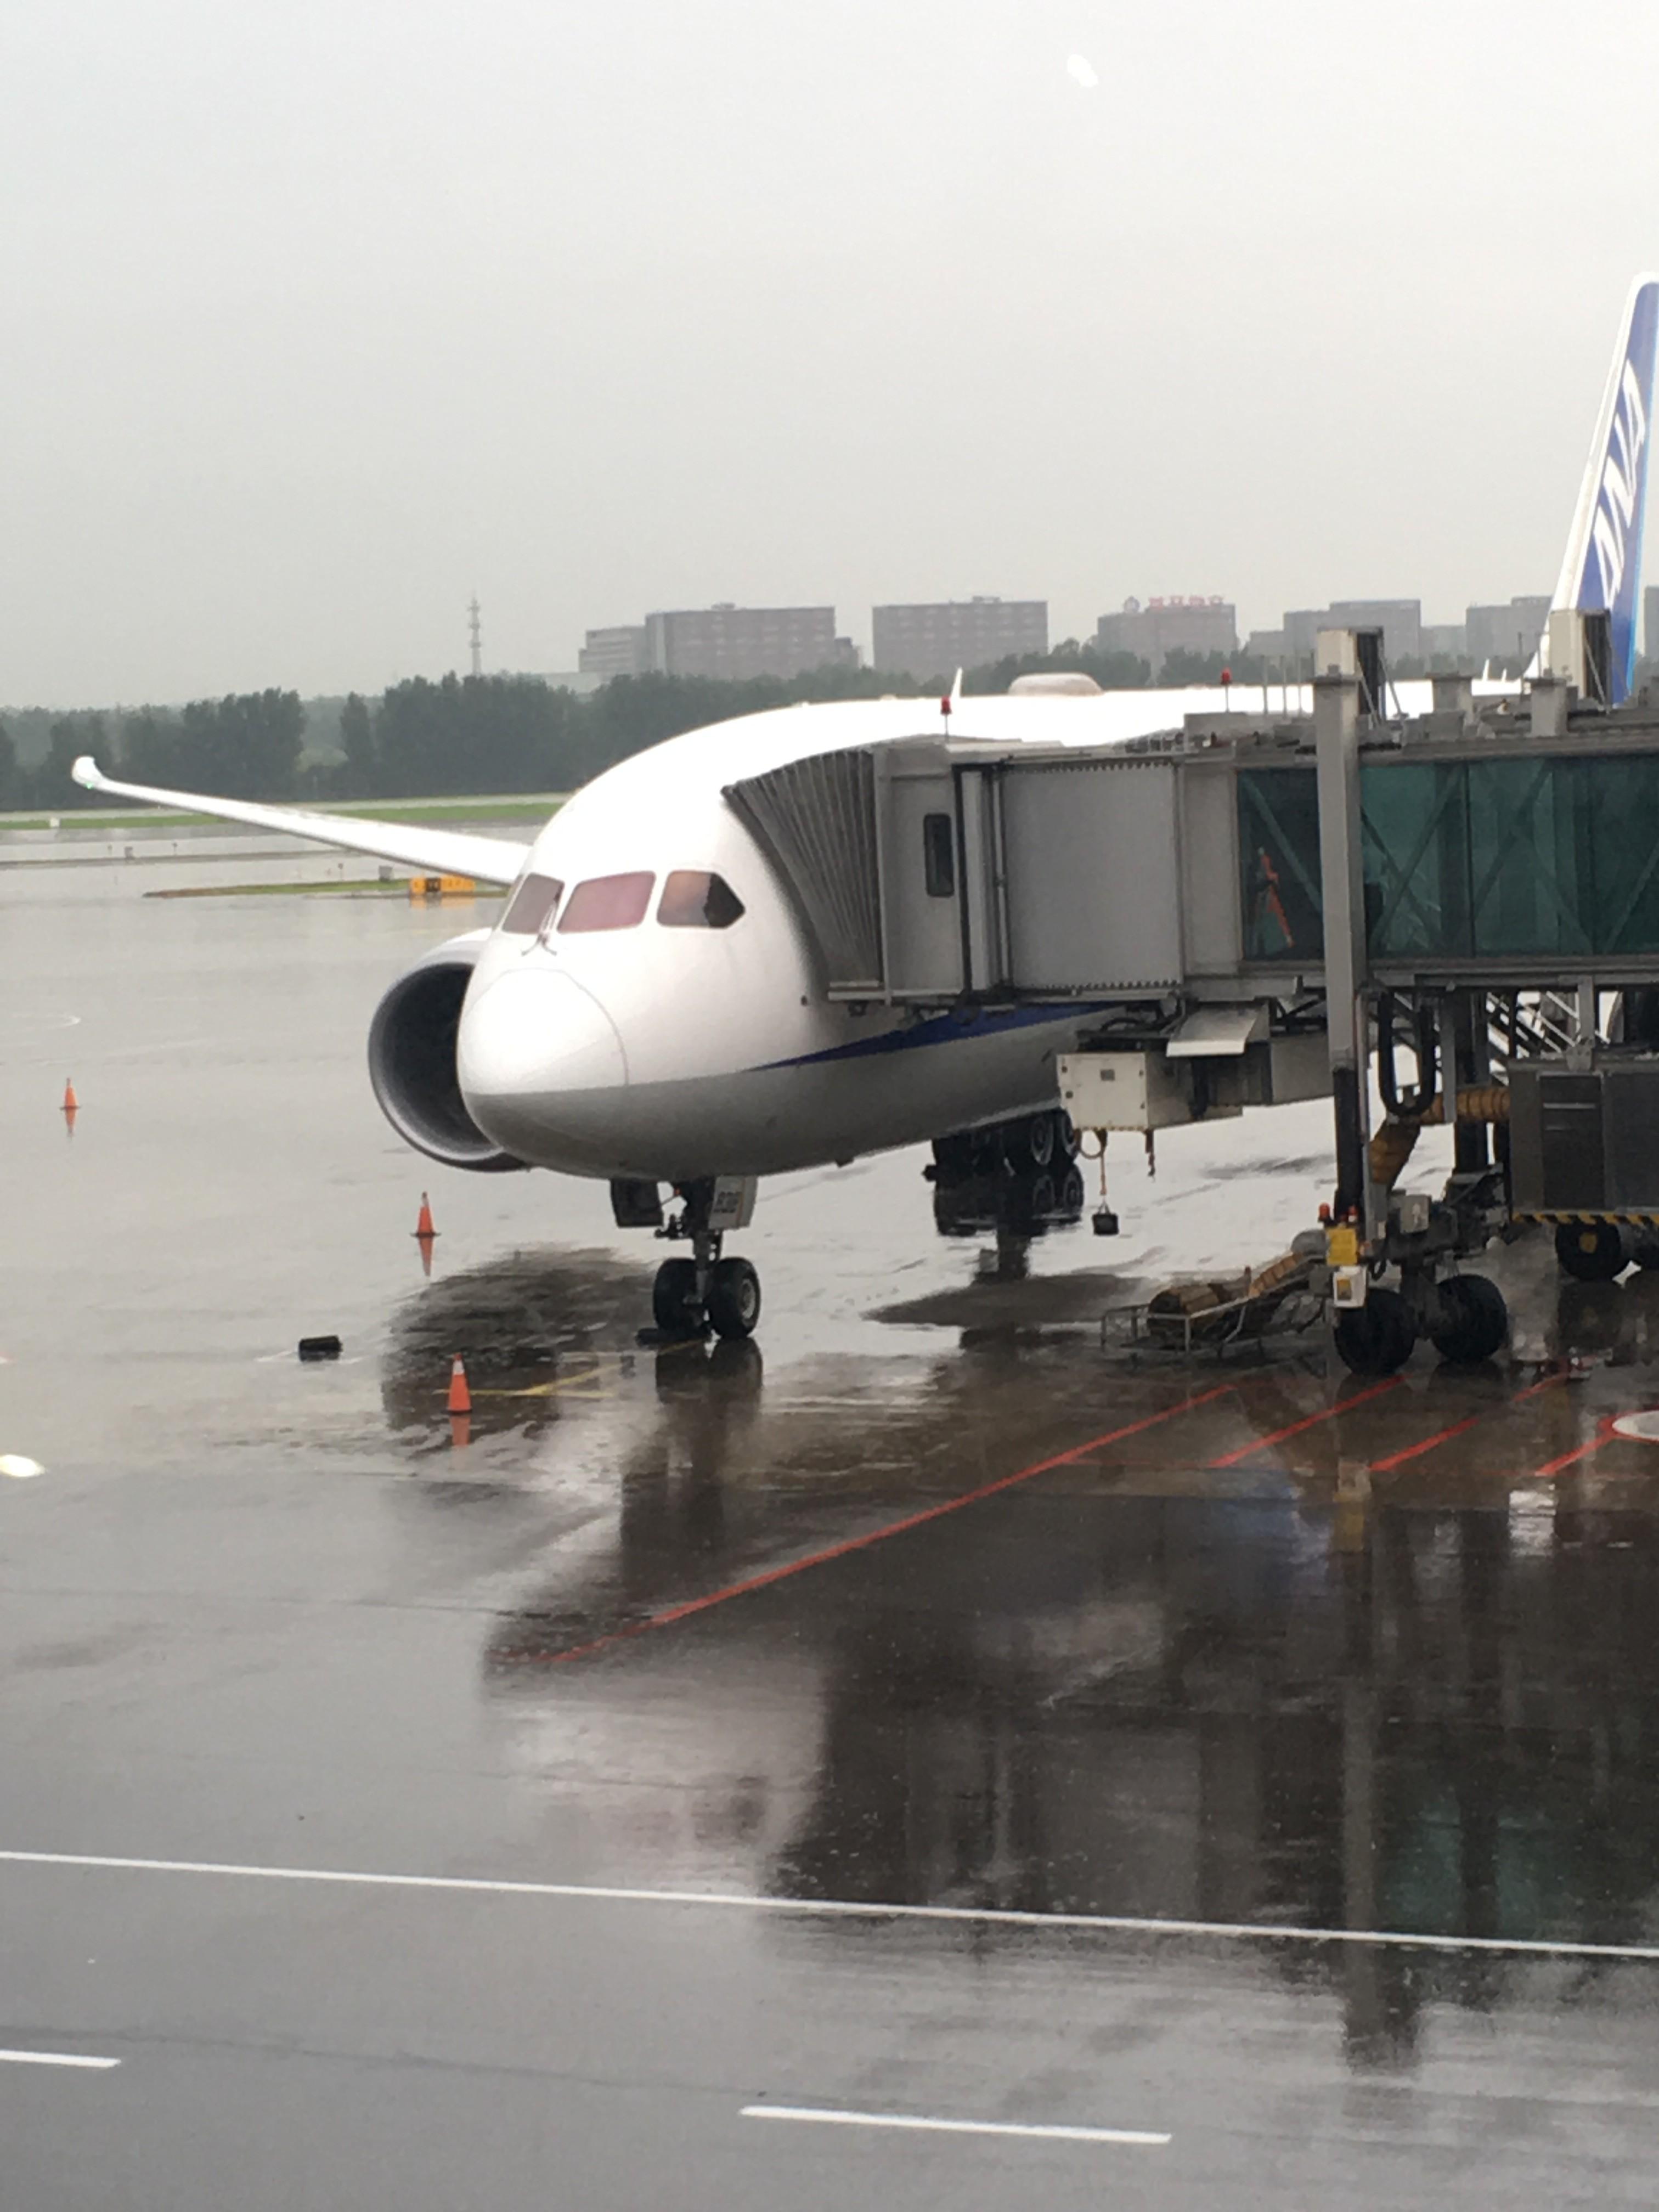 Re:[原创]~骚年飞行篇~补充半年前的香港之路,国航CA111 PEK-HKG,有幸坐到大擦第50架77W BOEING 787-8 JA838A 中国北京首都国际机场